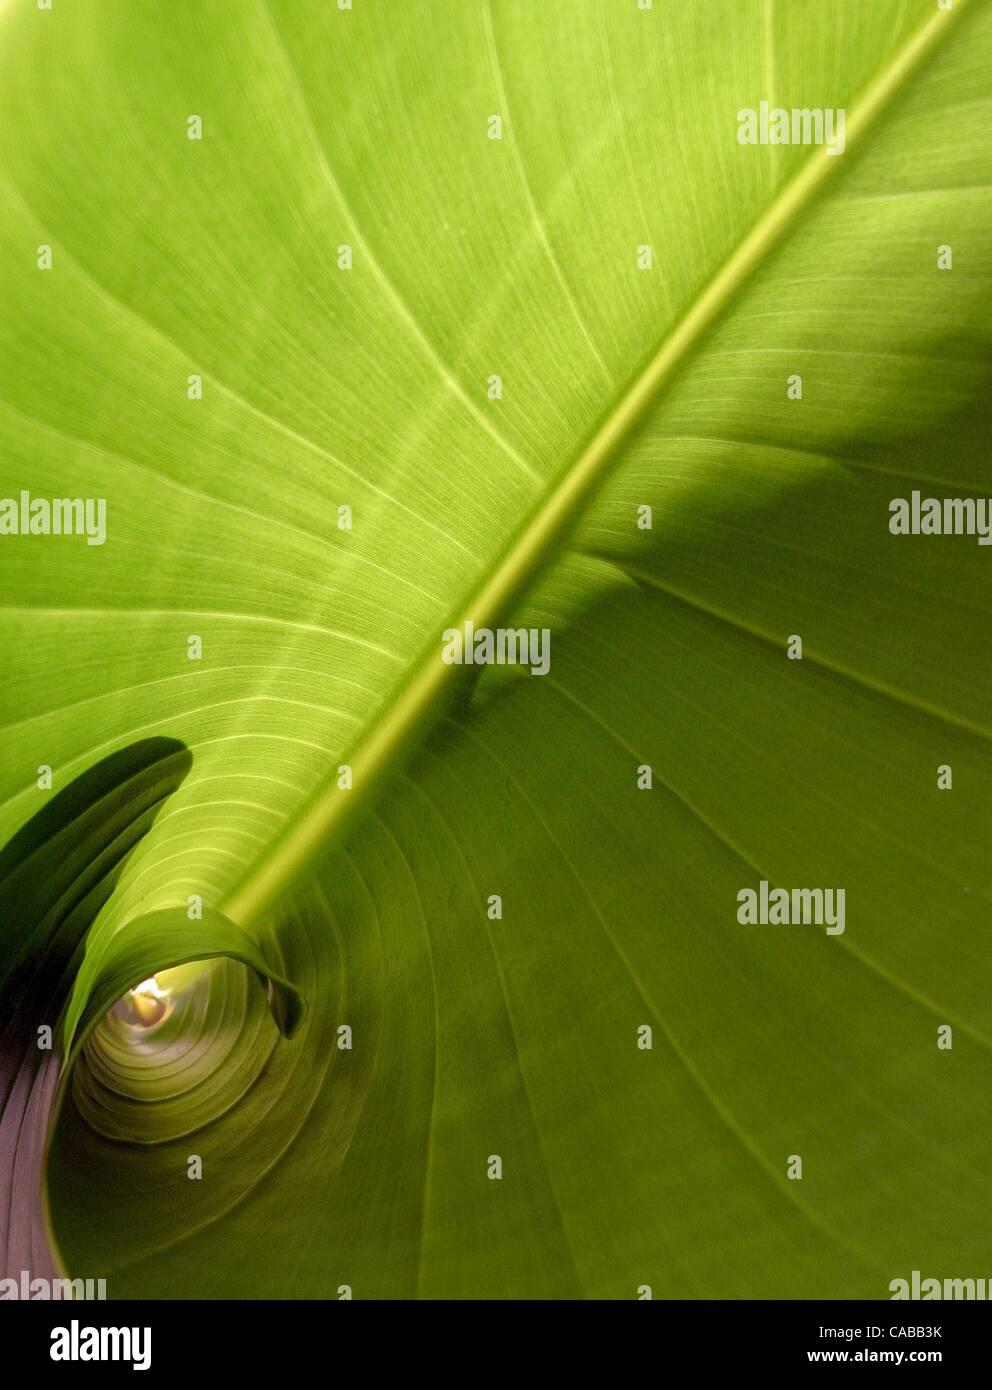 3. Juni 2004; Los Angeles, Kalifornien, USA; Bananenpflanze. Stockfoto